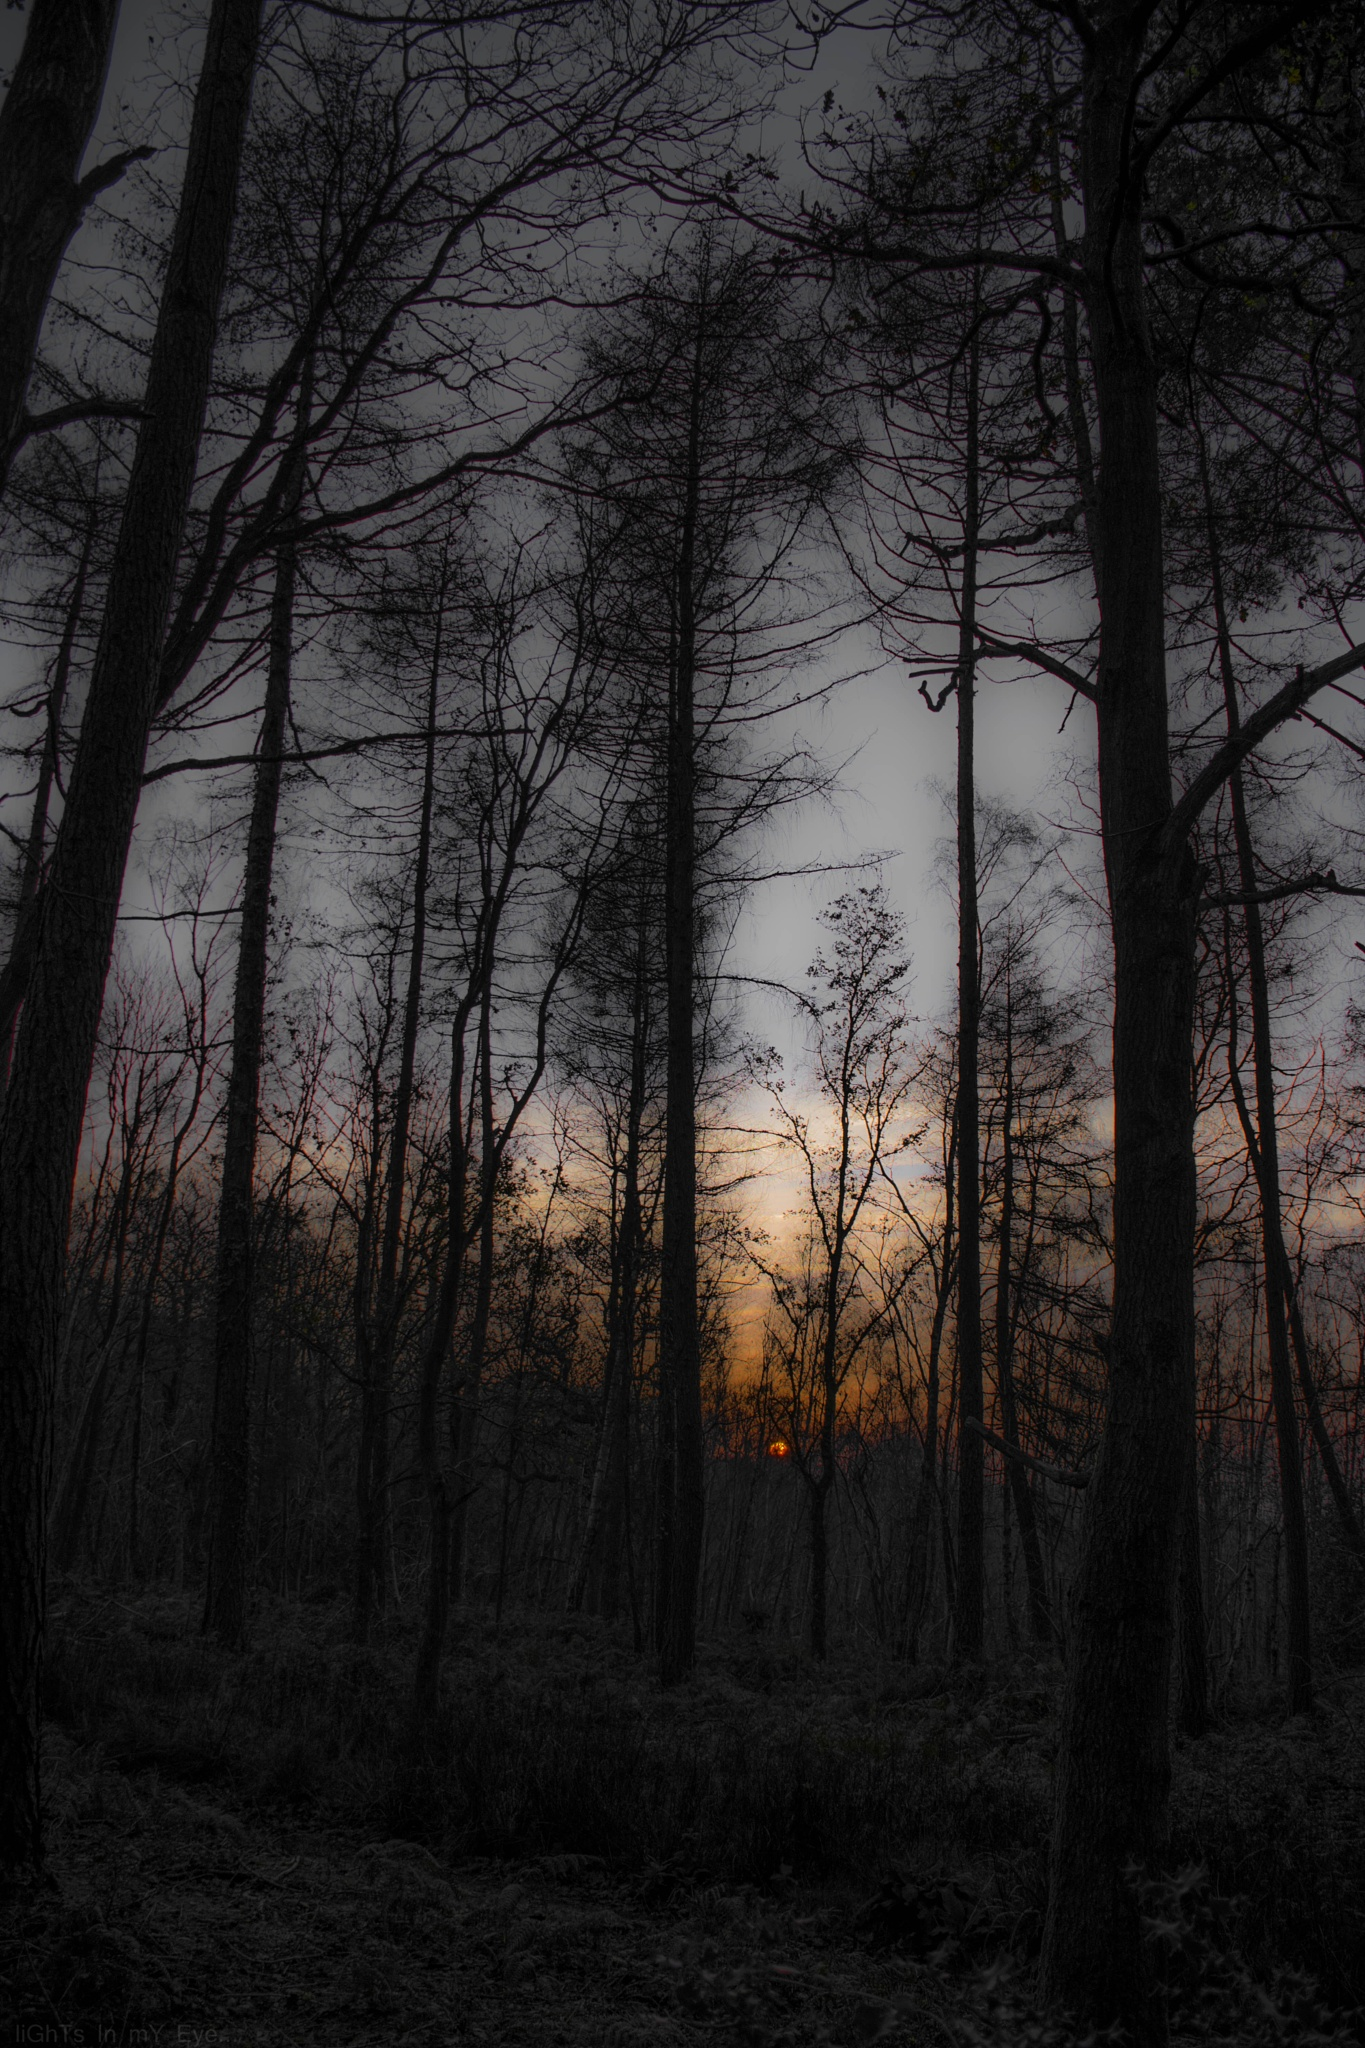 dusk wood by neil.hickman1